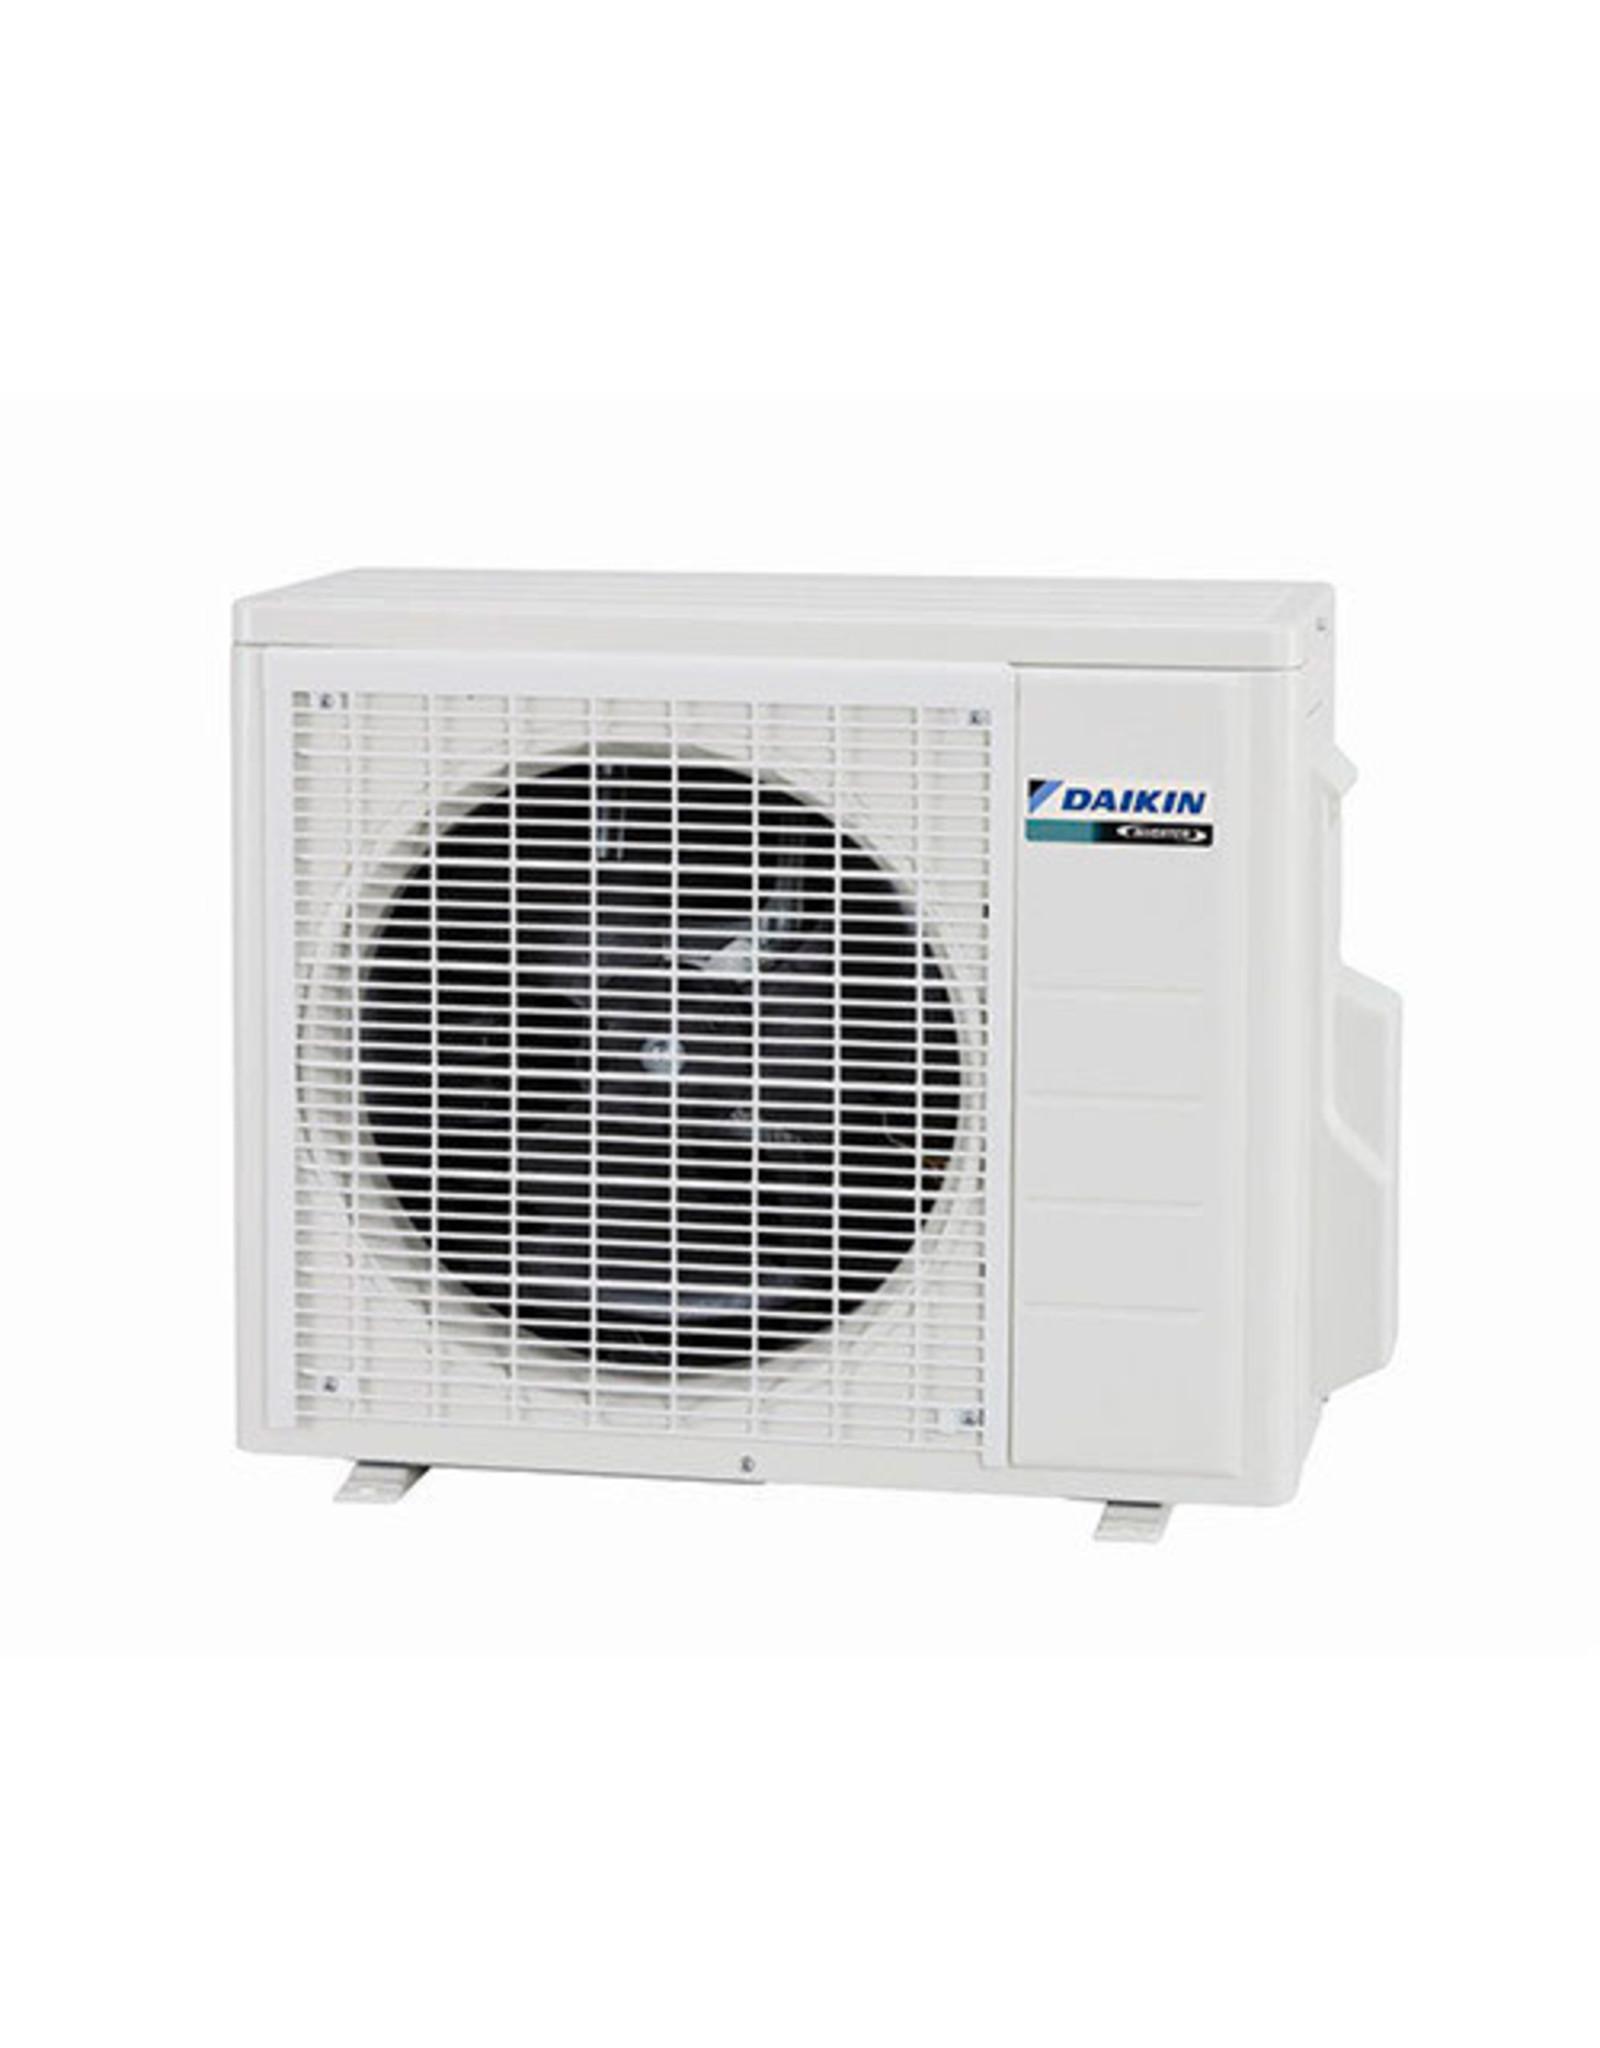 Daikin Applied Americas LV Series Heat-Pump Single Zone Condenser Unit - 208/230v - 1ph